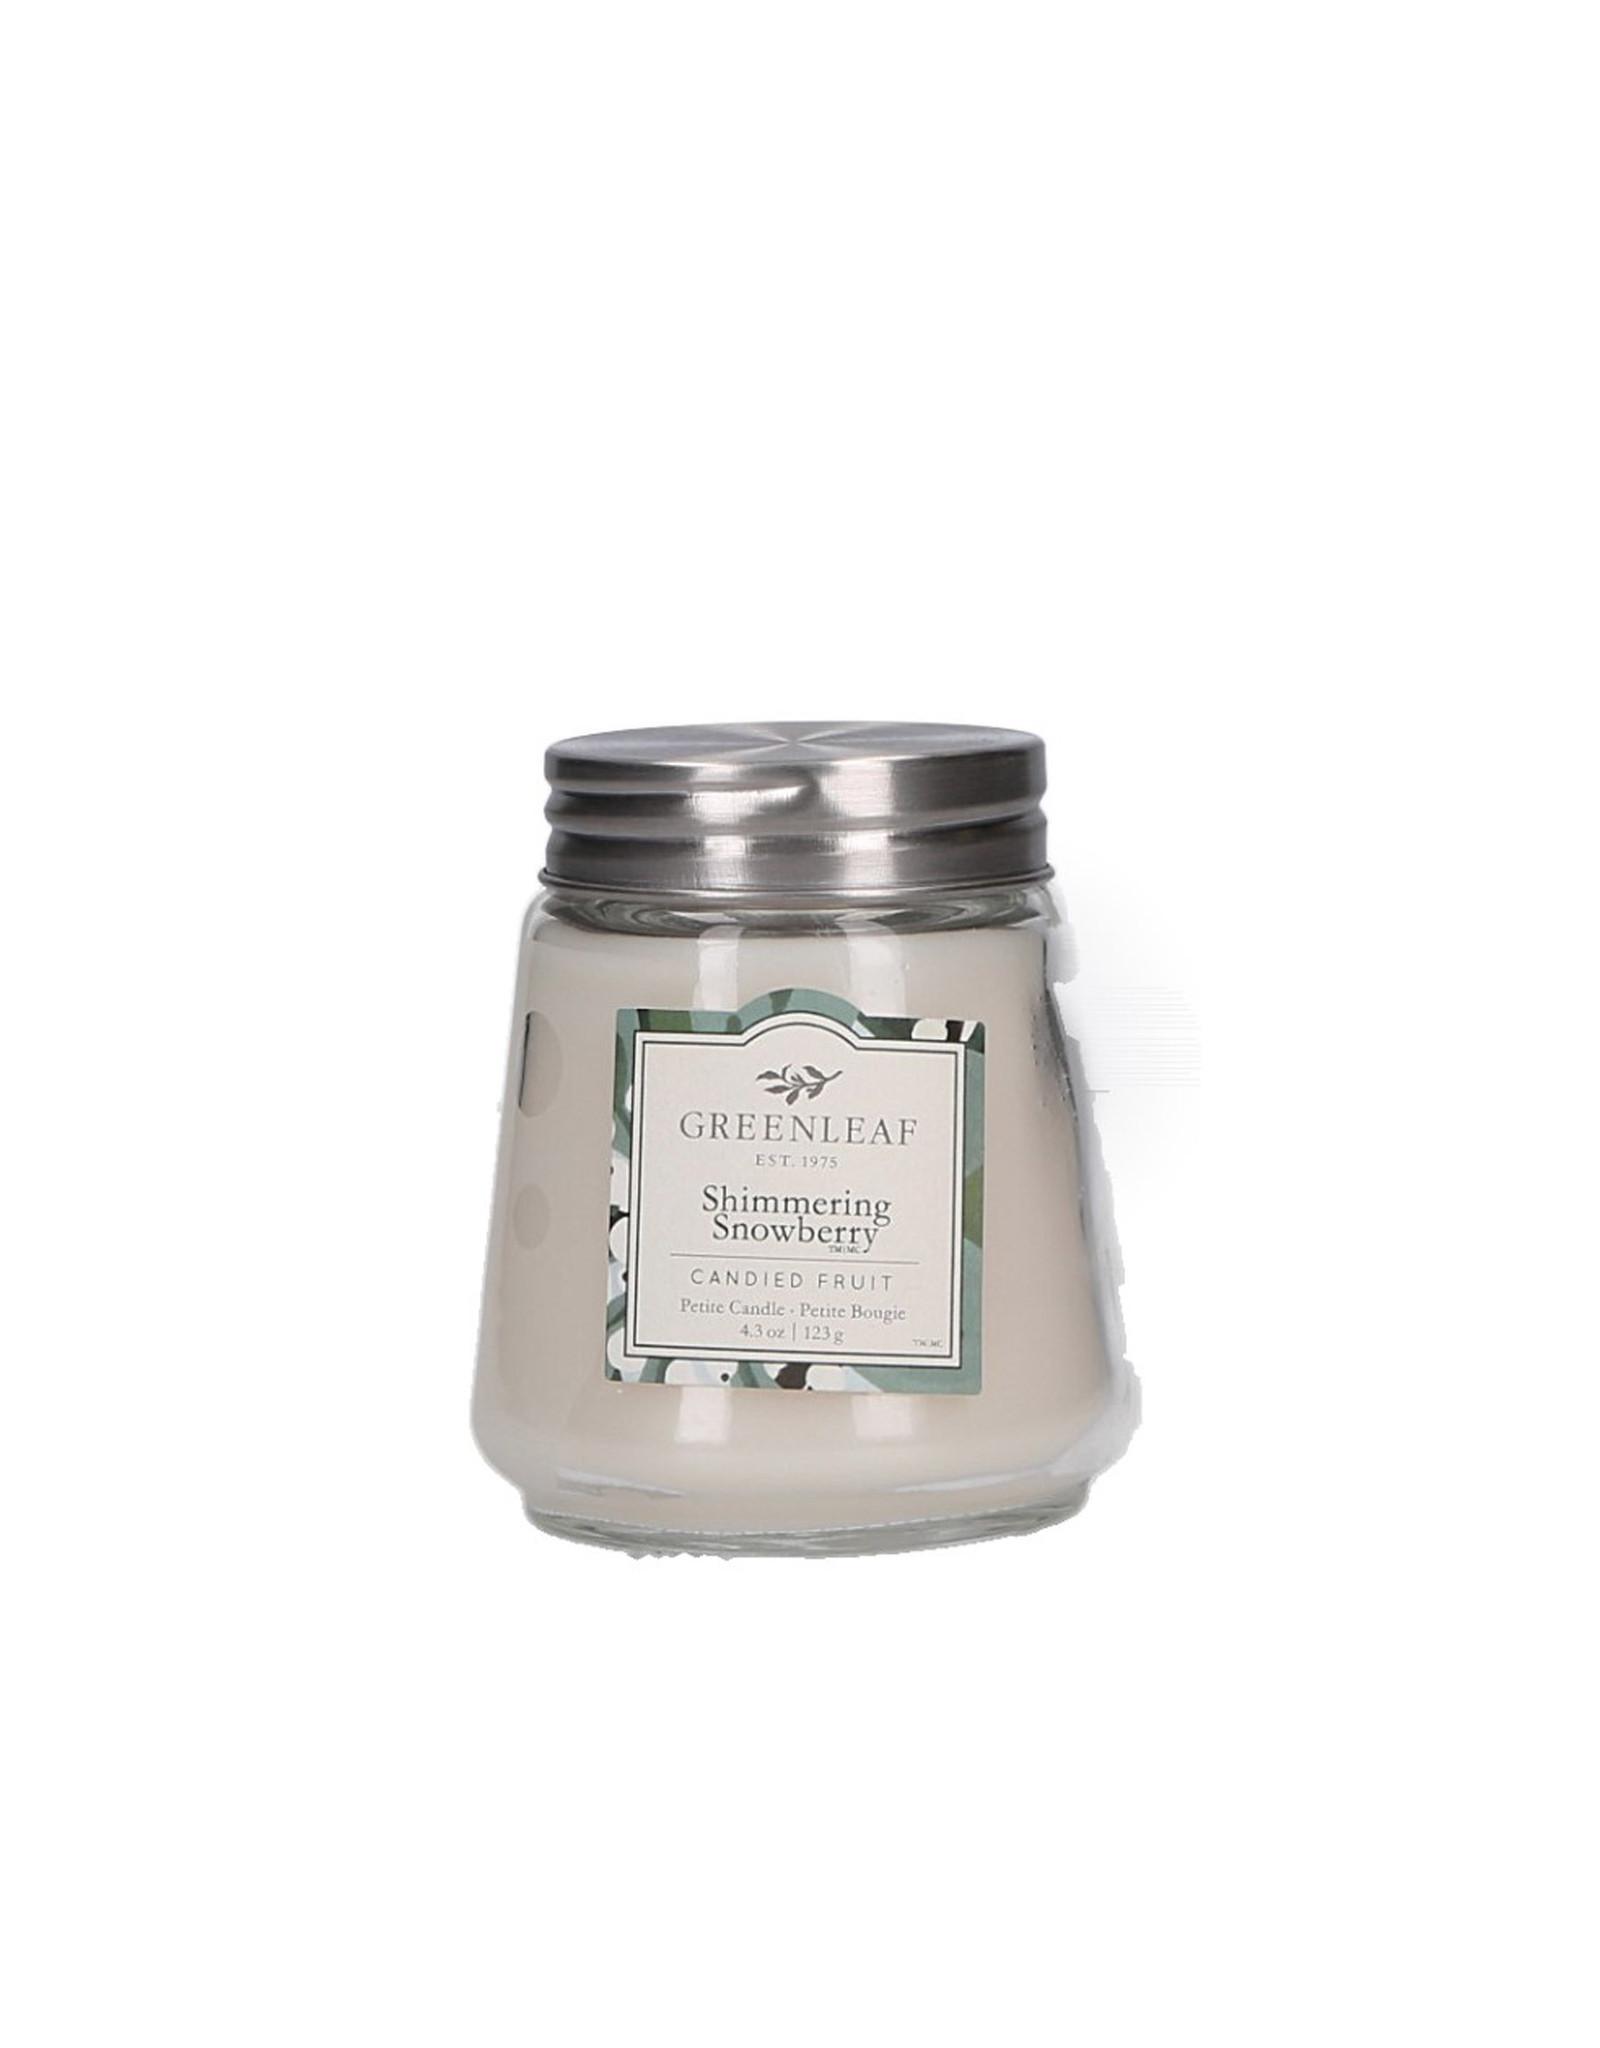 Greenleaf Shimmering Snowberry Candle Petite